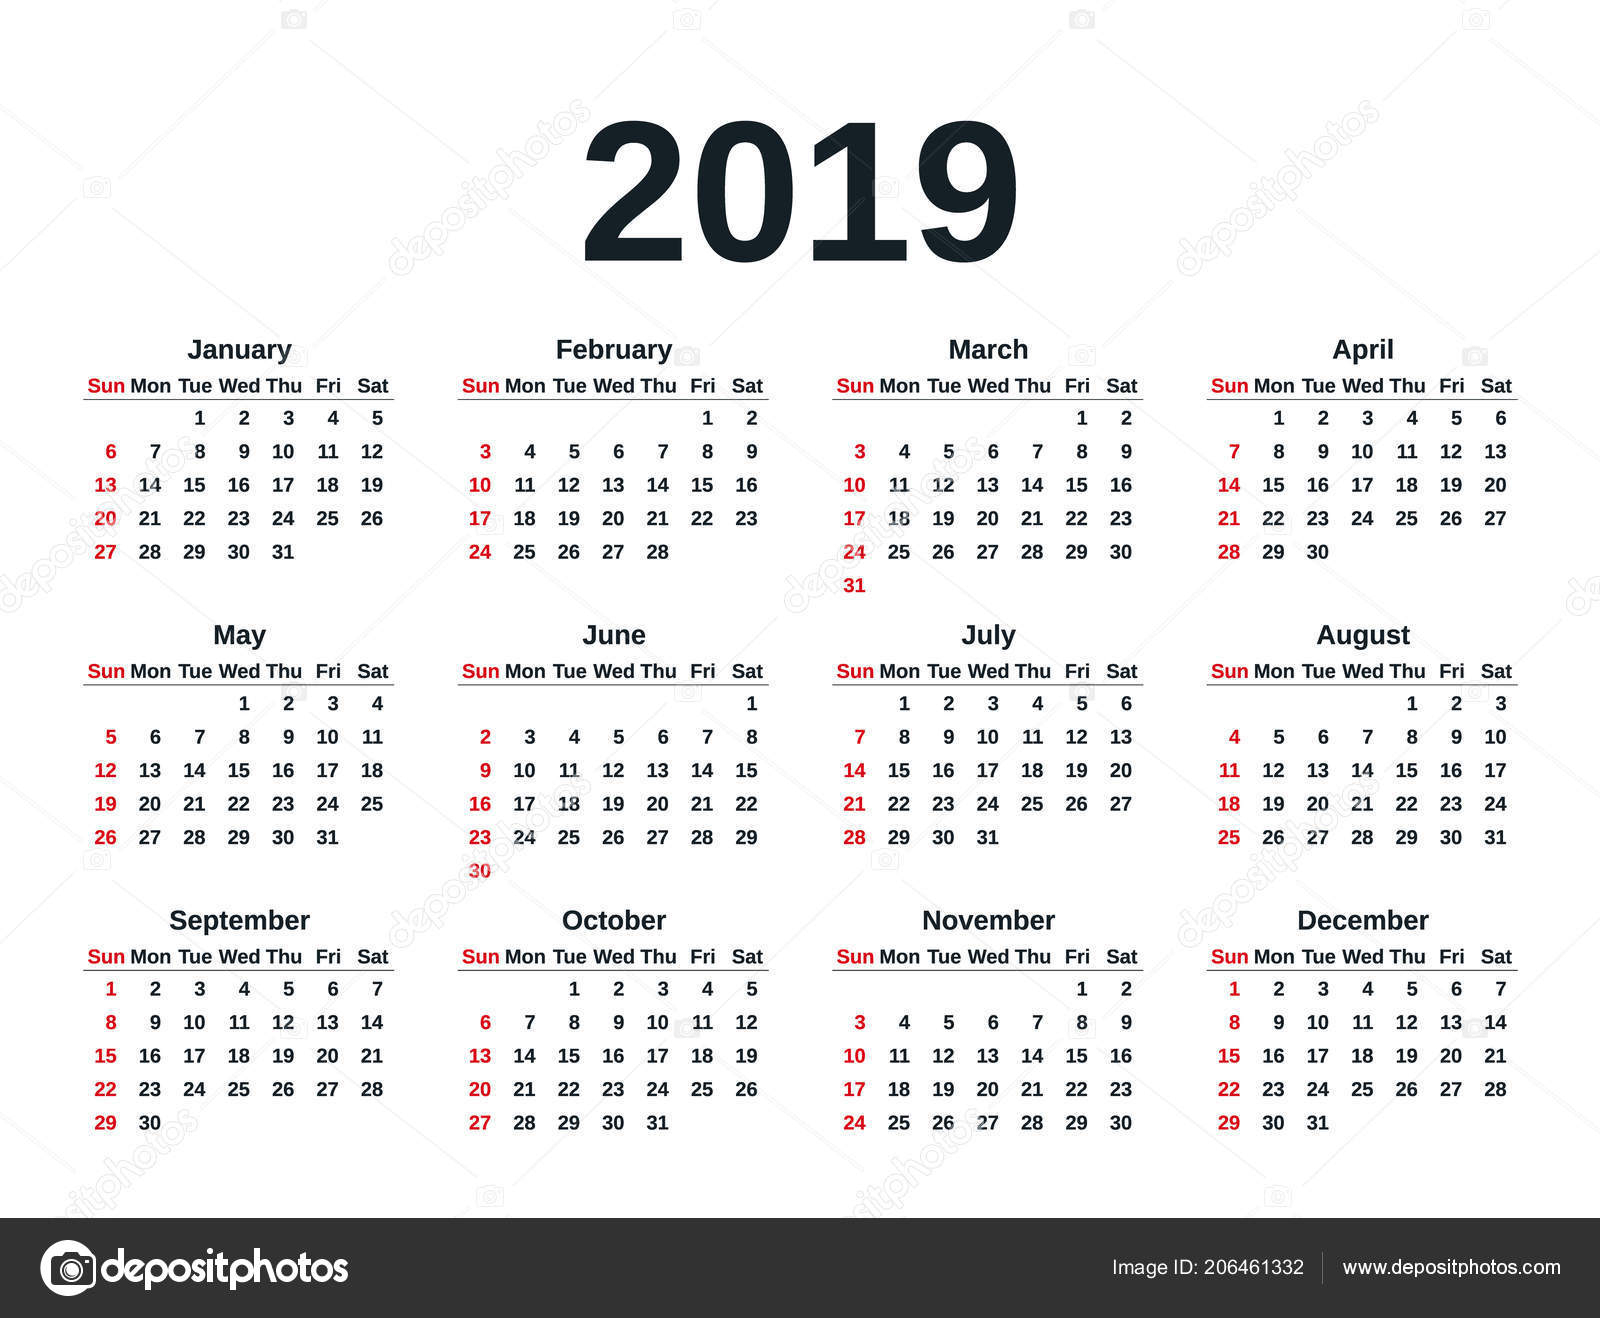 Calendar 2019 Simple Style Week Starts Sunday Vector